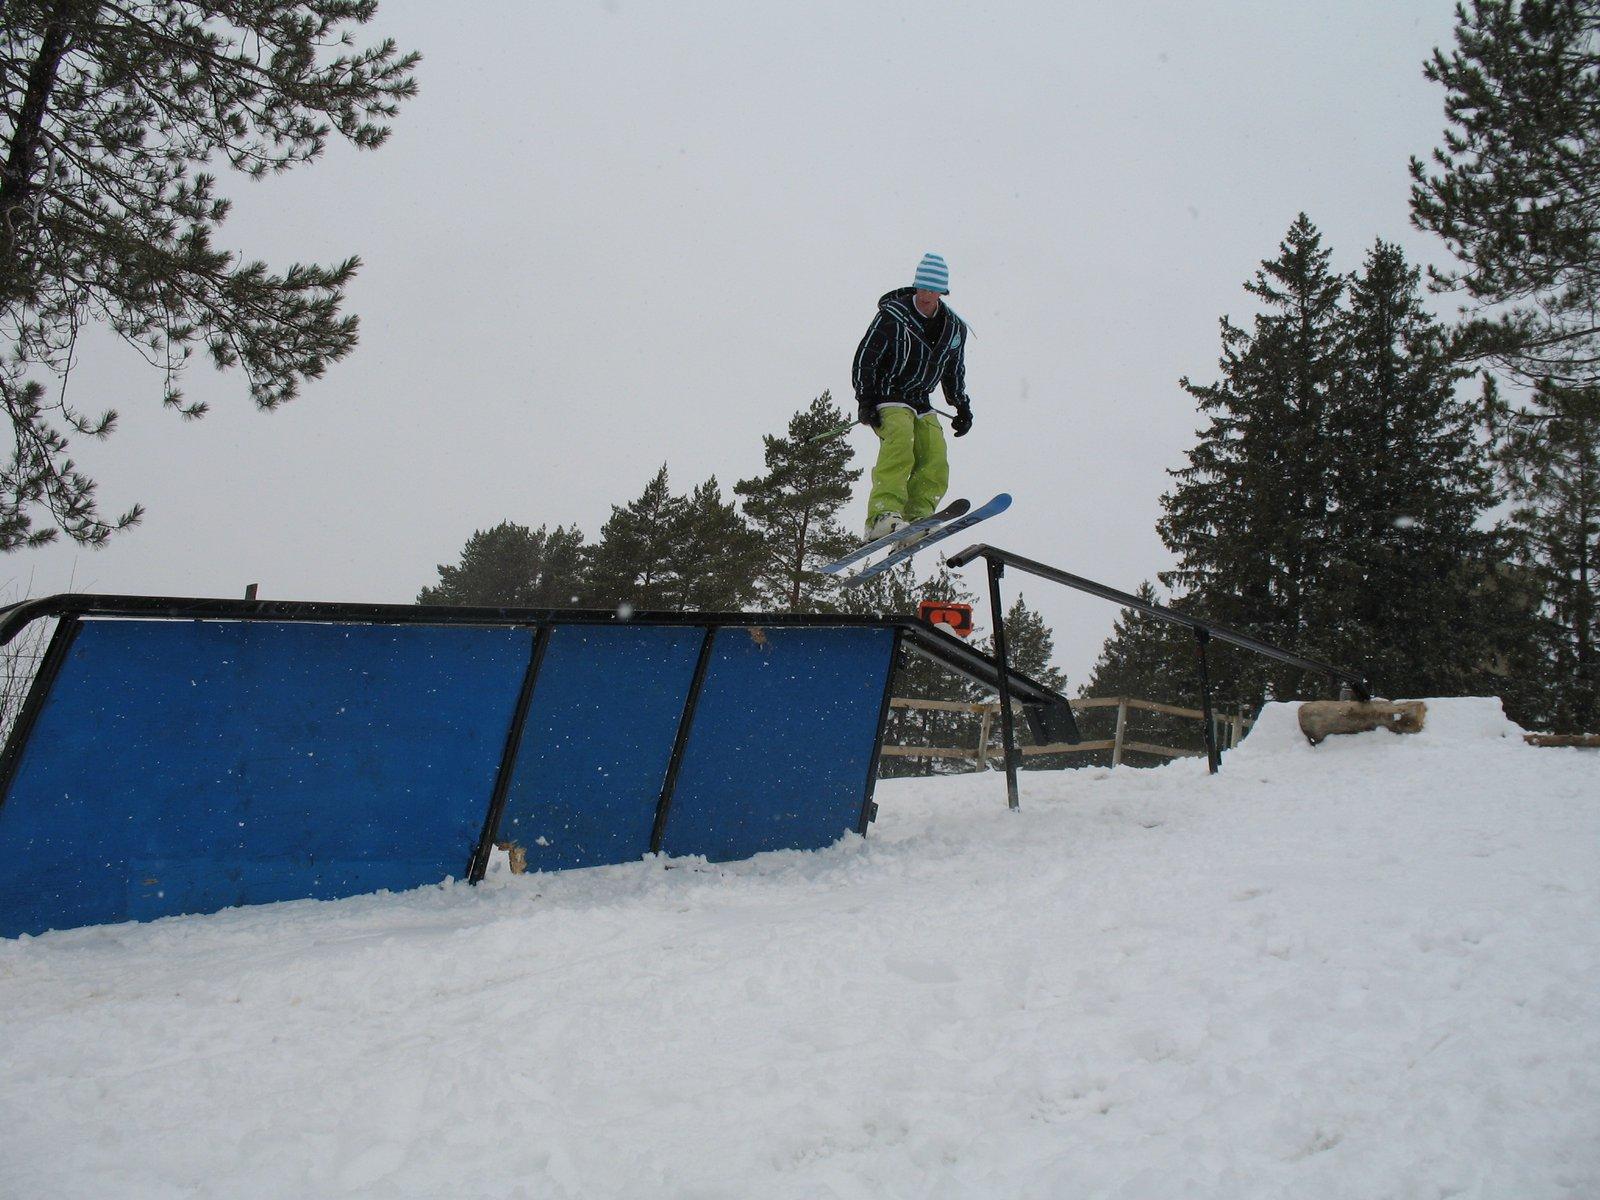 Up rail to down box